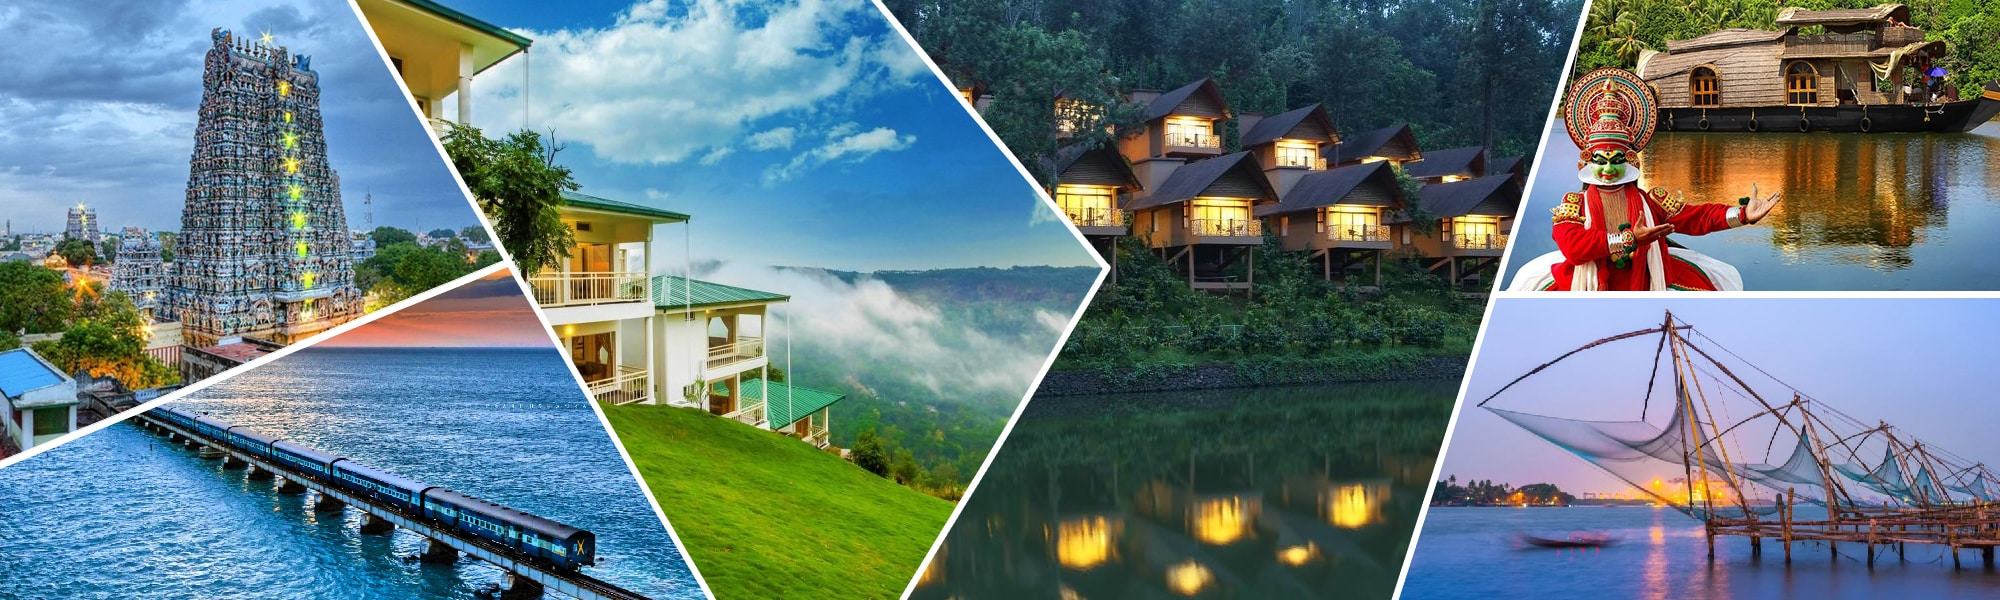 Munnar, Alappuzha, Kochi, Thekkady, Rameswaram, and Madurai – Fun & Sprite Package Tour